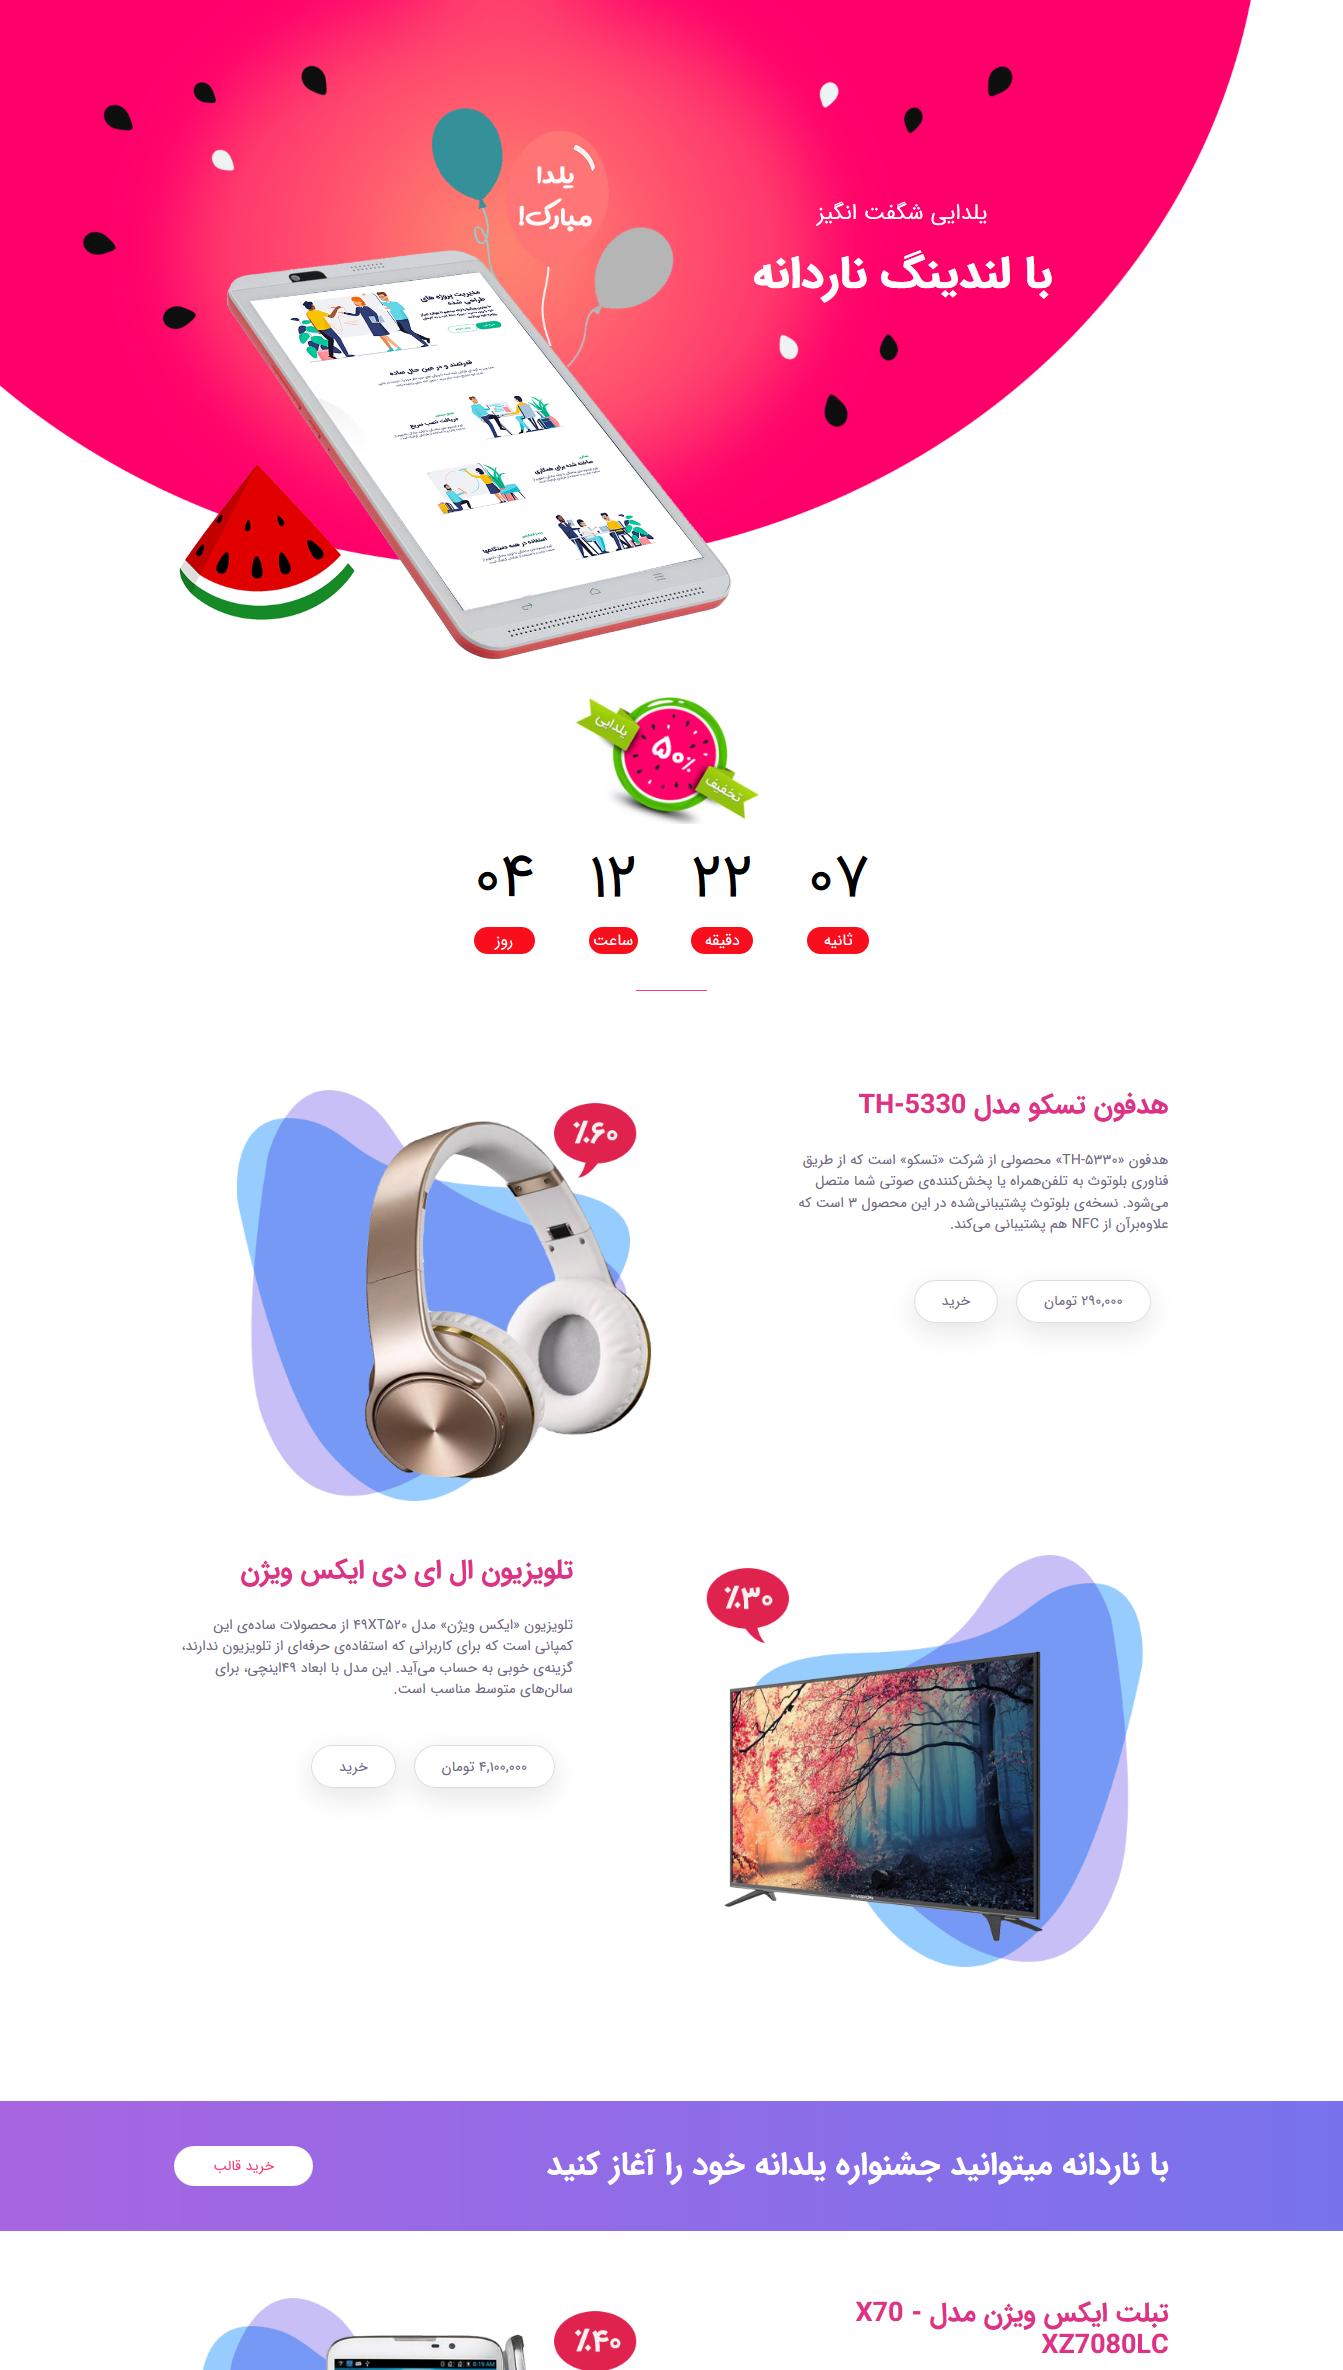 قالب HTML لندینگ پیج ناردانه به مناسبت جشنواره یلدا نسخه 2.1